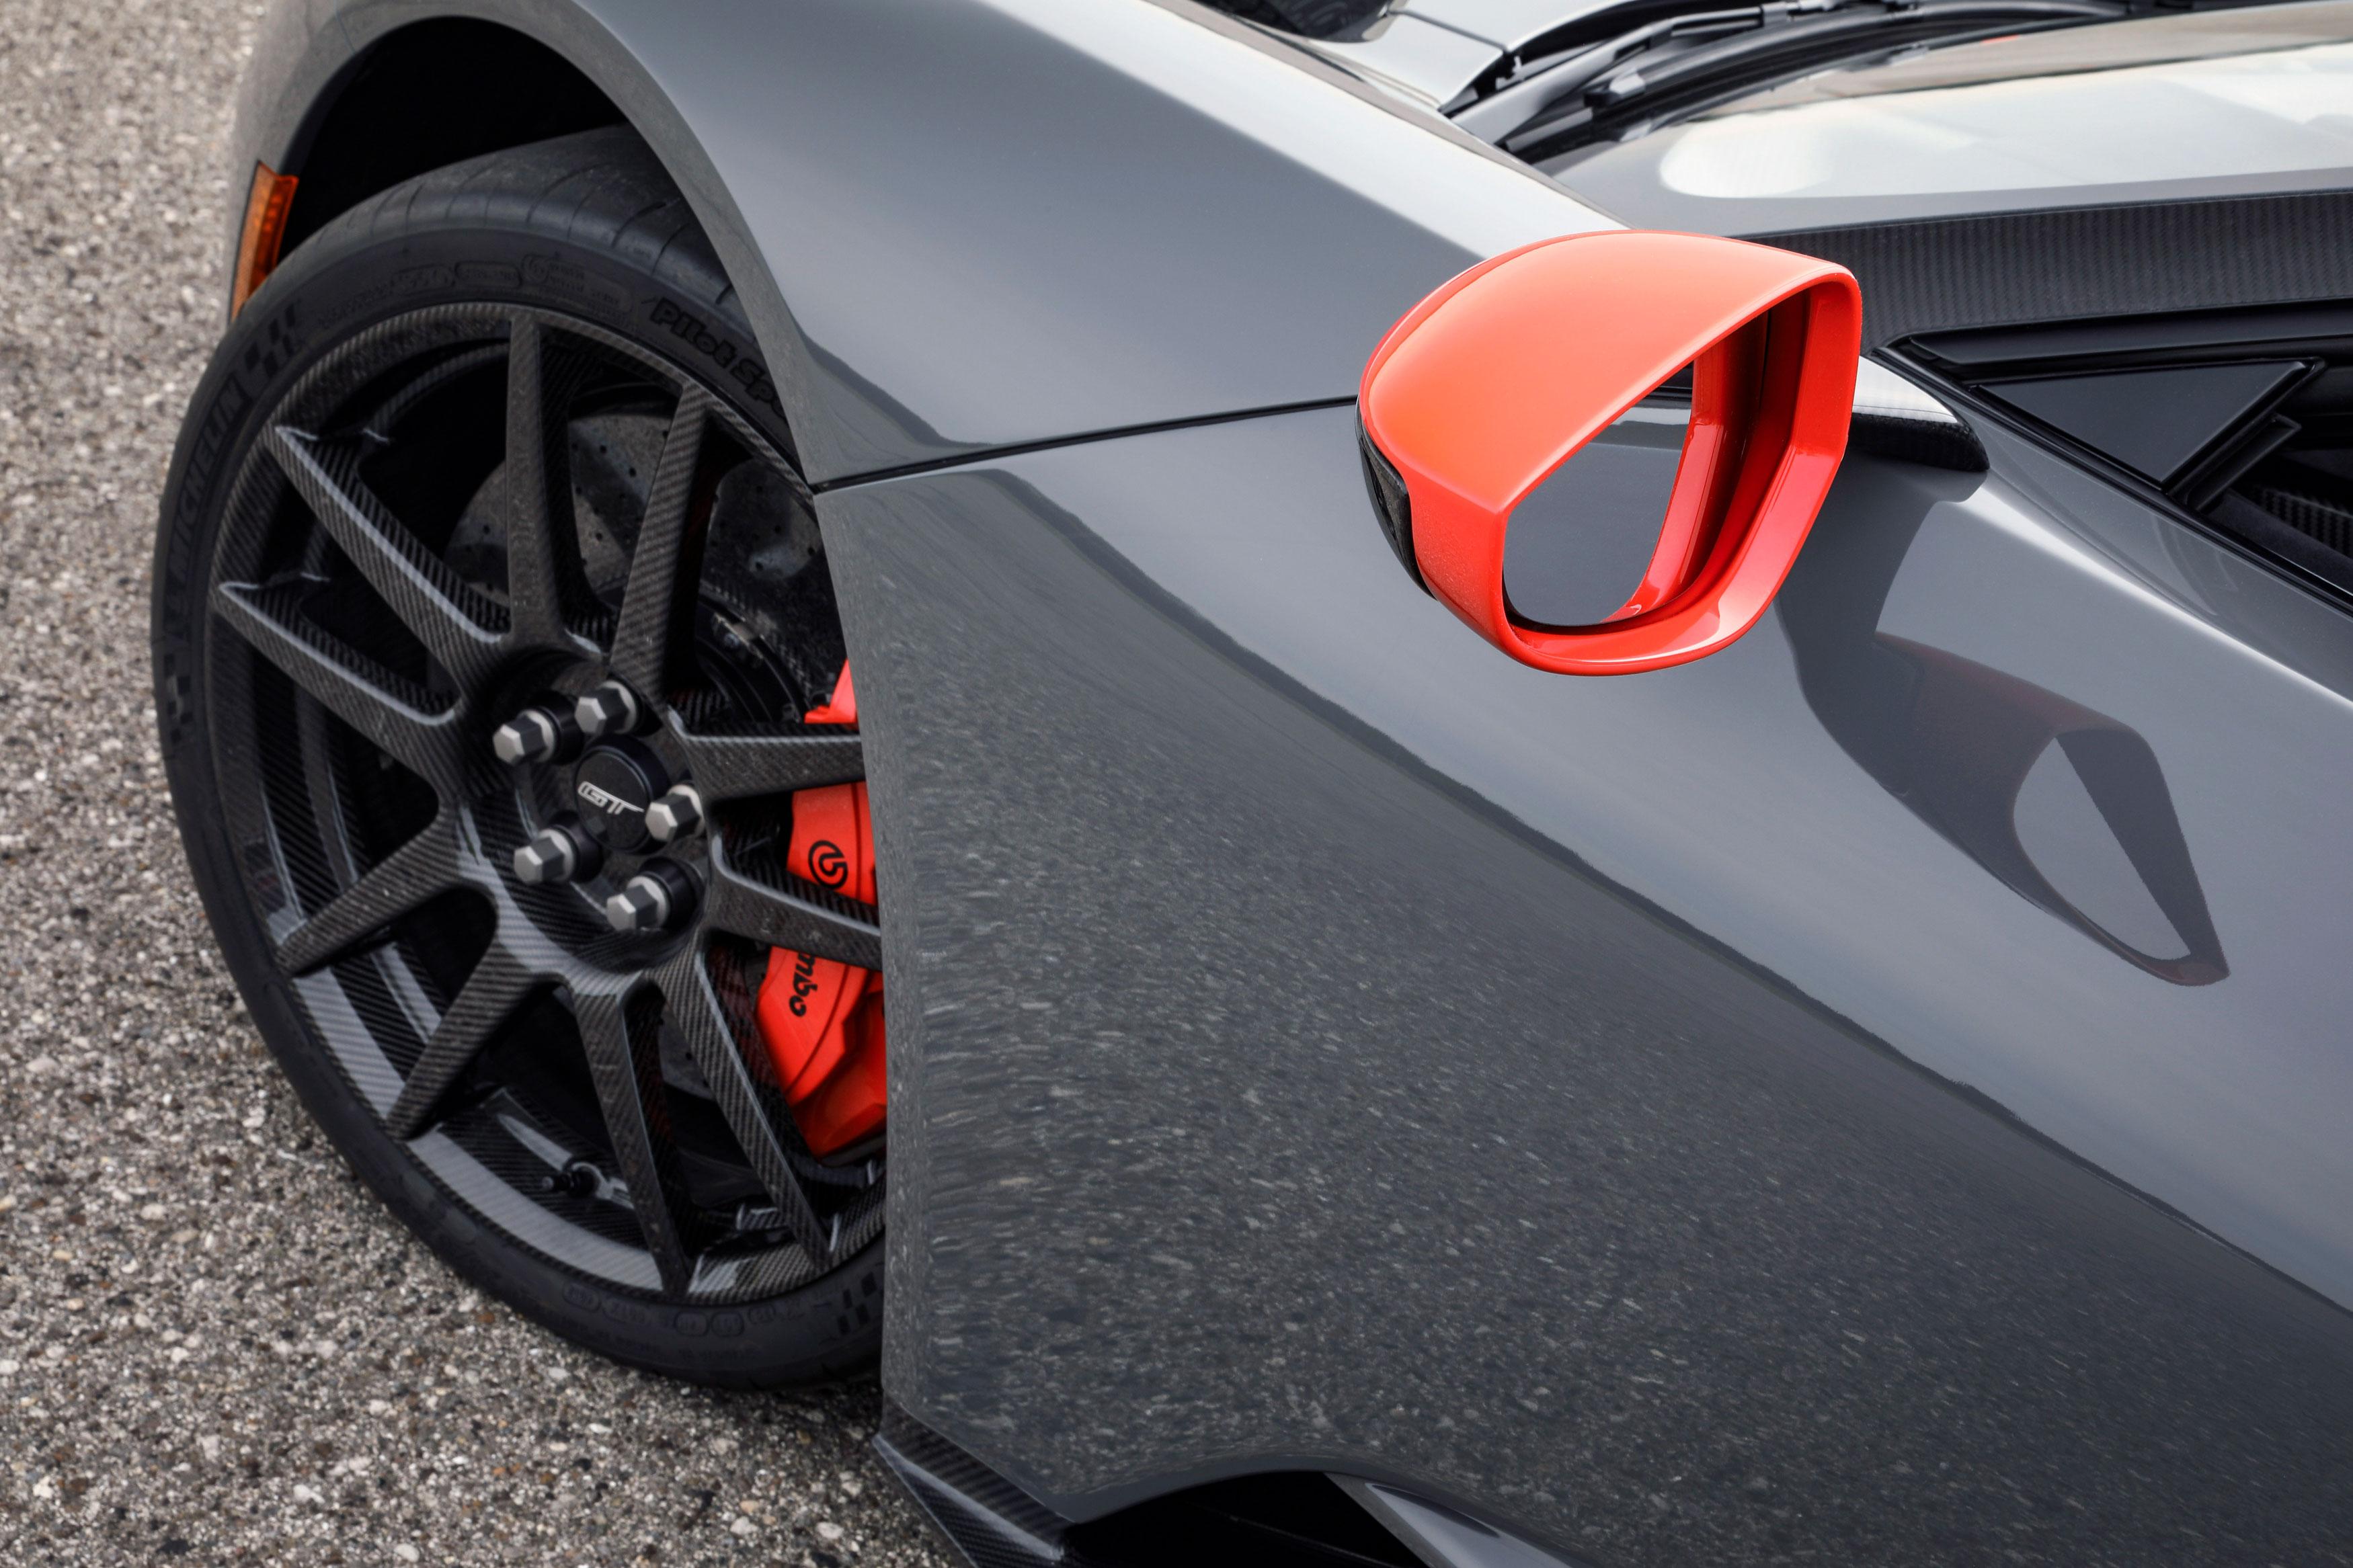 2019 ford gt carbon series fiber wheels titanium lug nuts